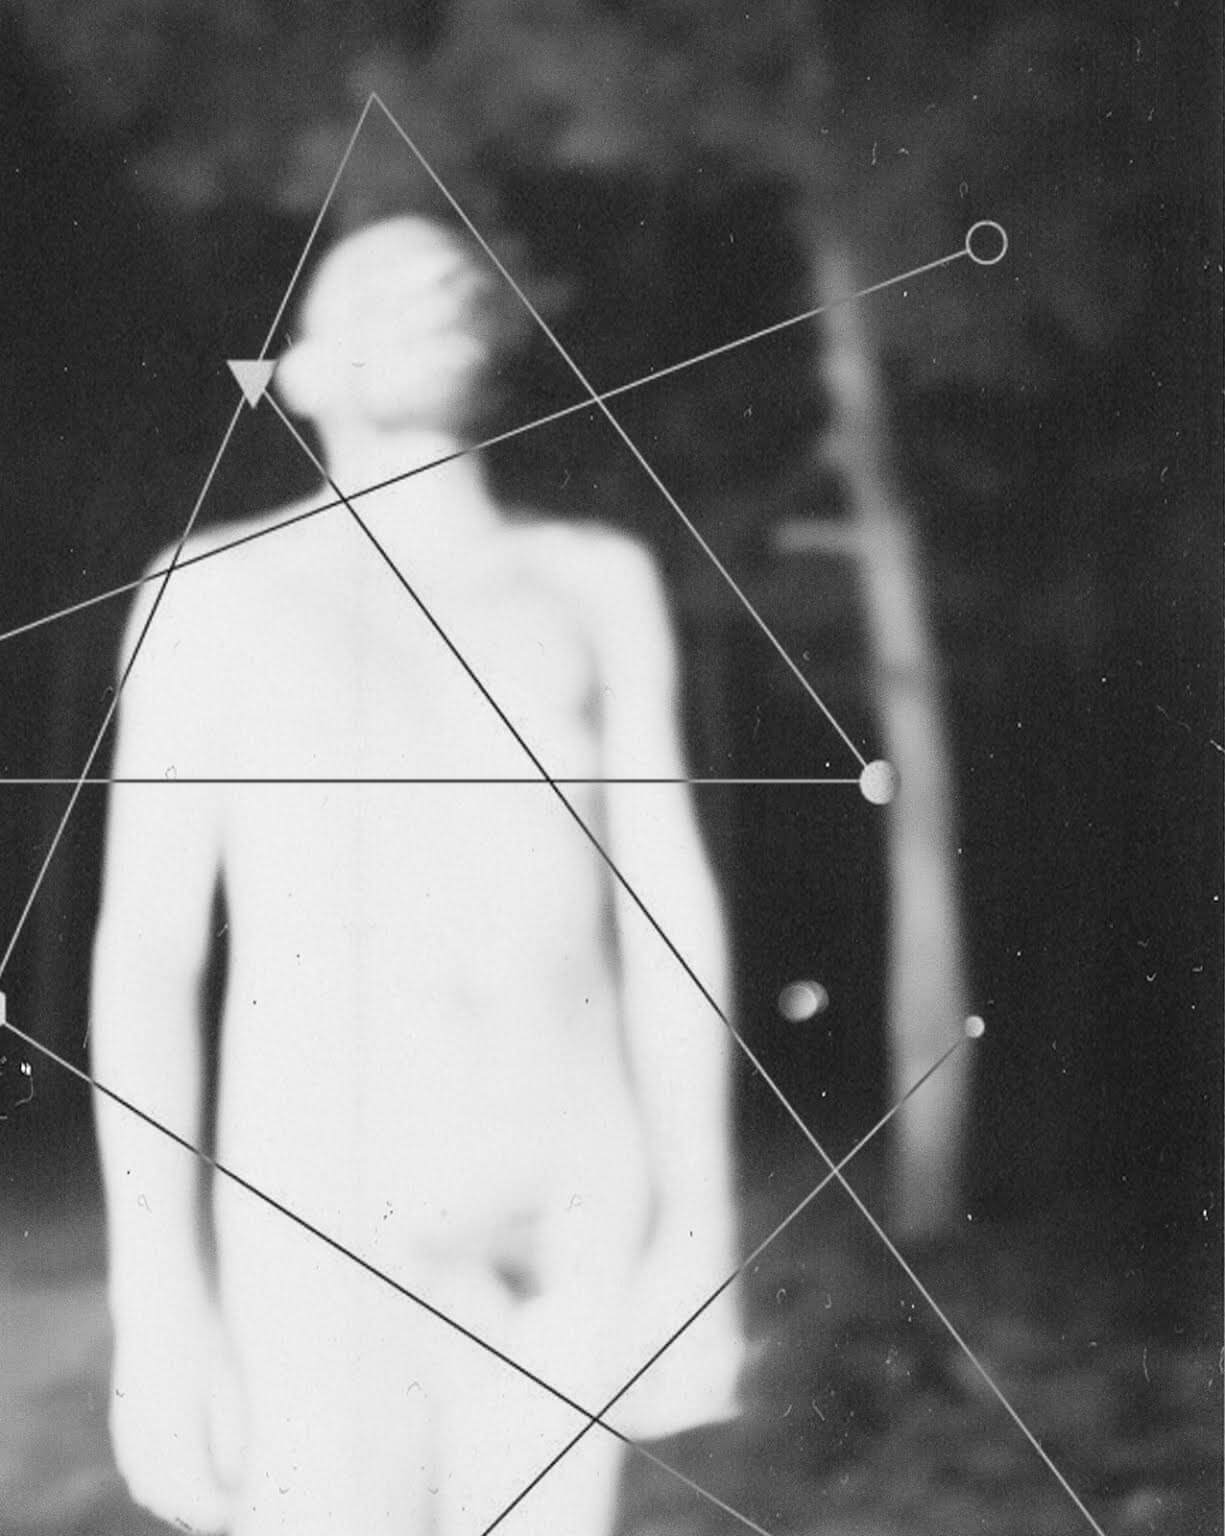 Fundamental space explorations of naked singulari_Sergey-Melnitchenko_Yogurt- Magazine22